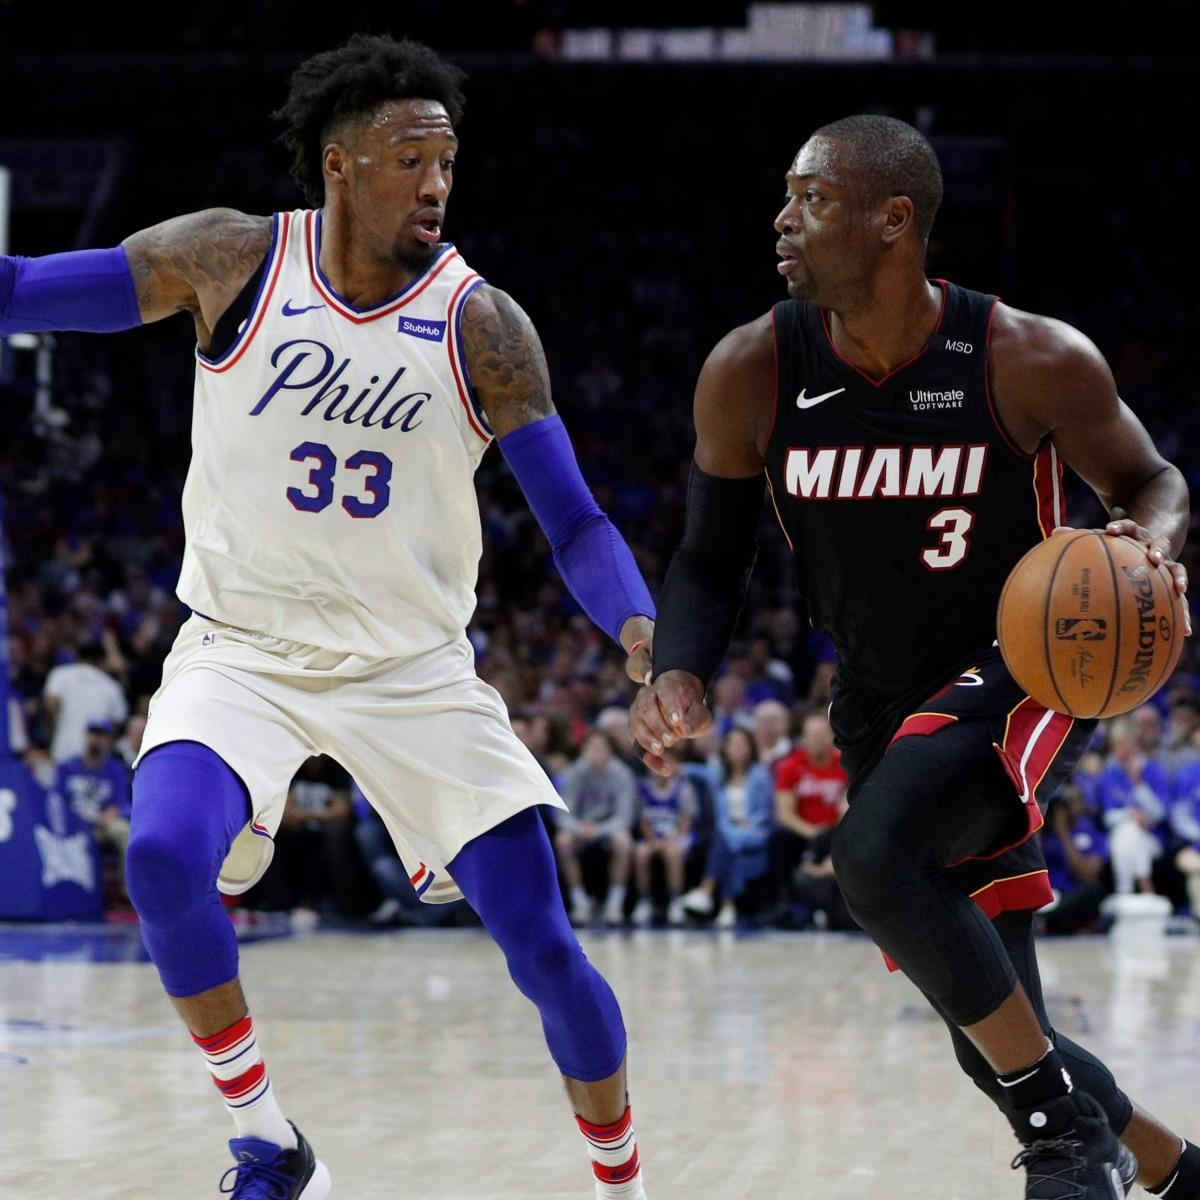 NBA Free Agents 2018: Rumors, Predictions for Greg Monroe, Dwyane Wade